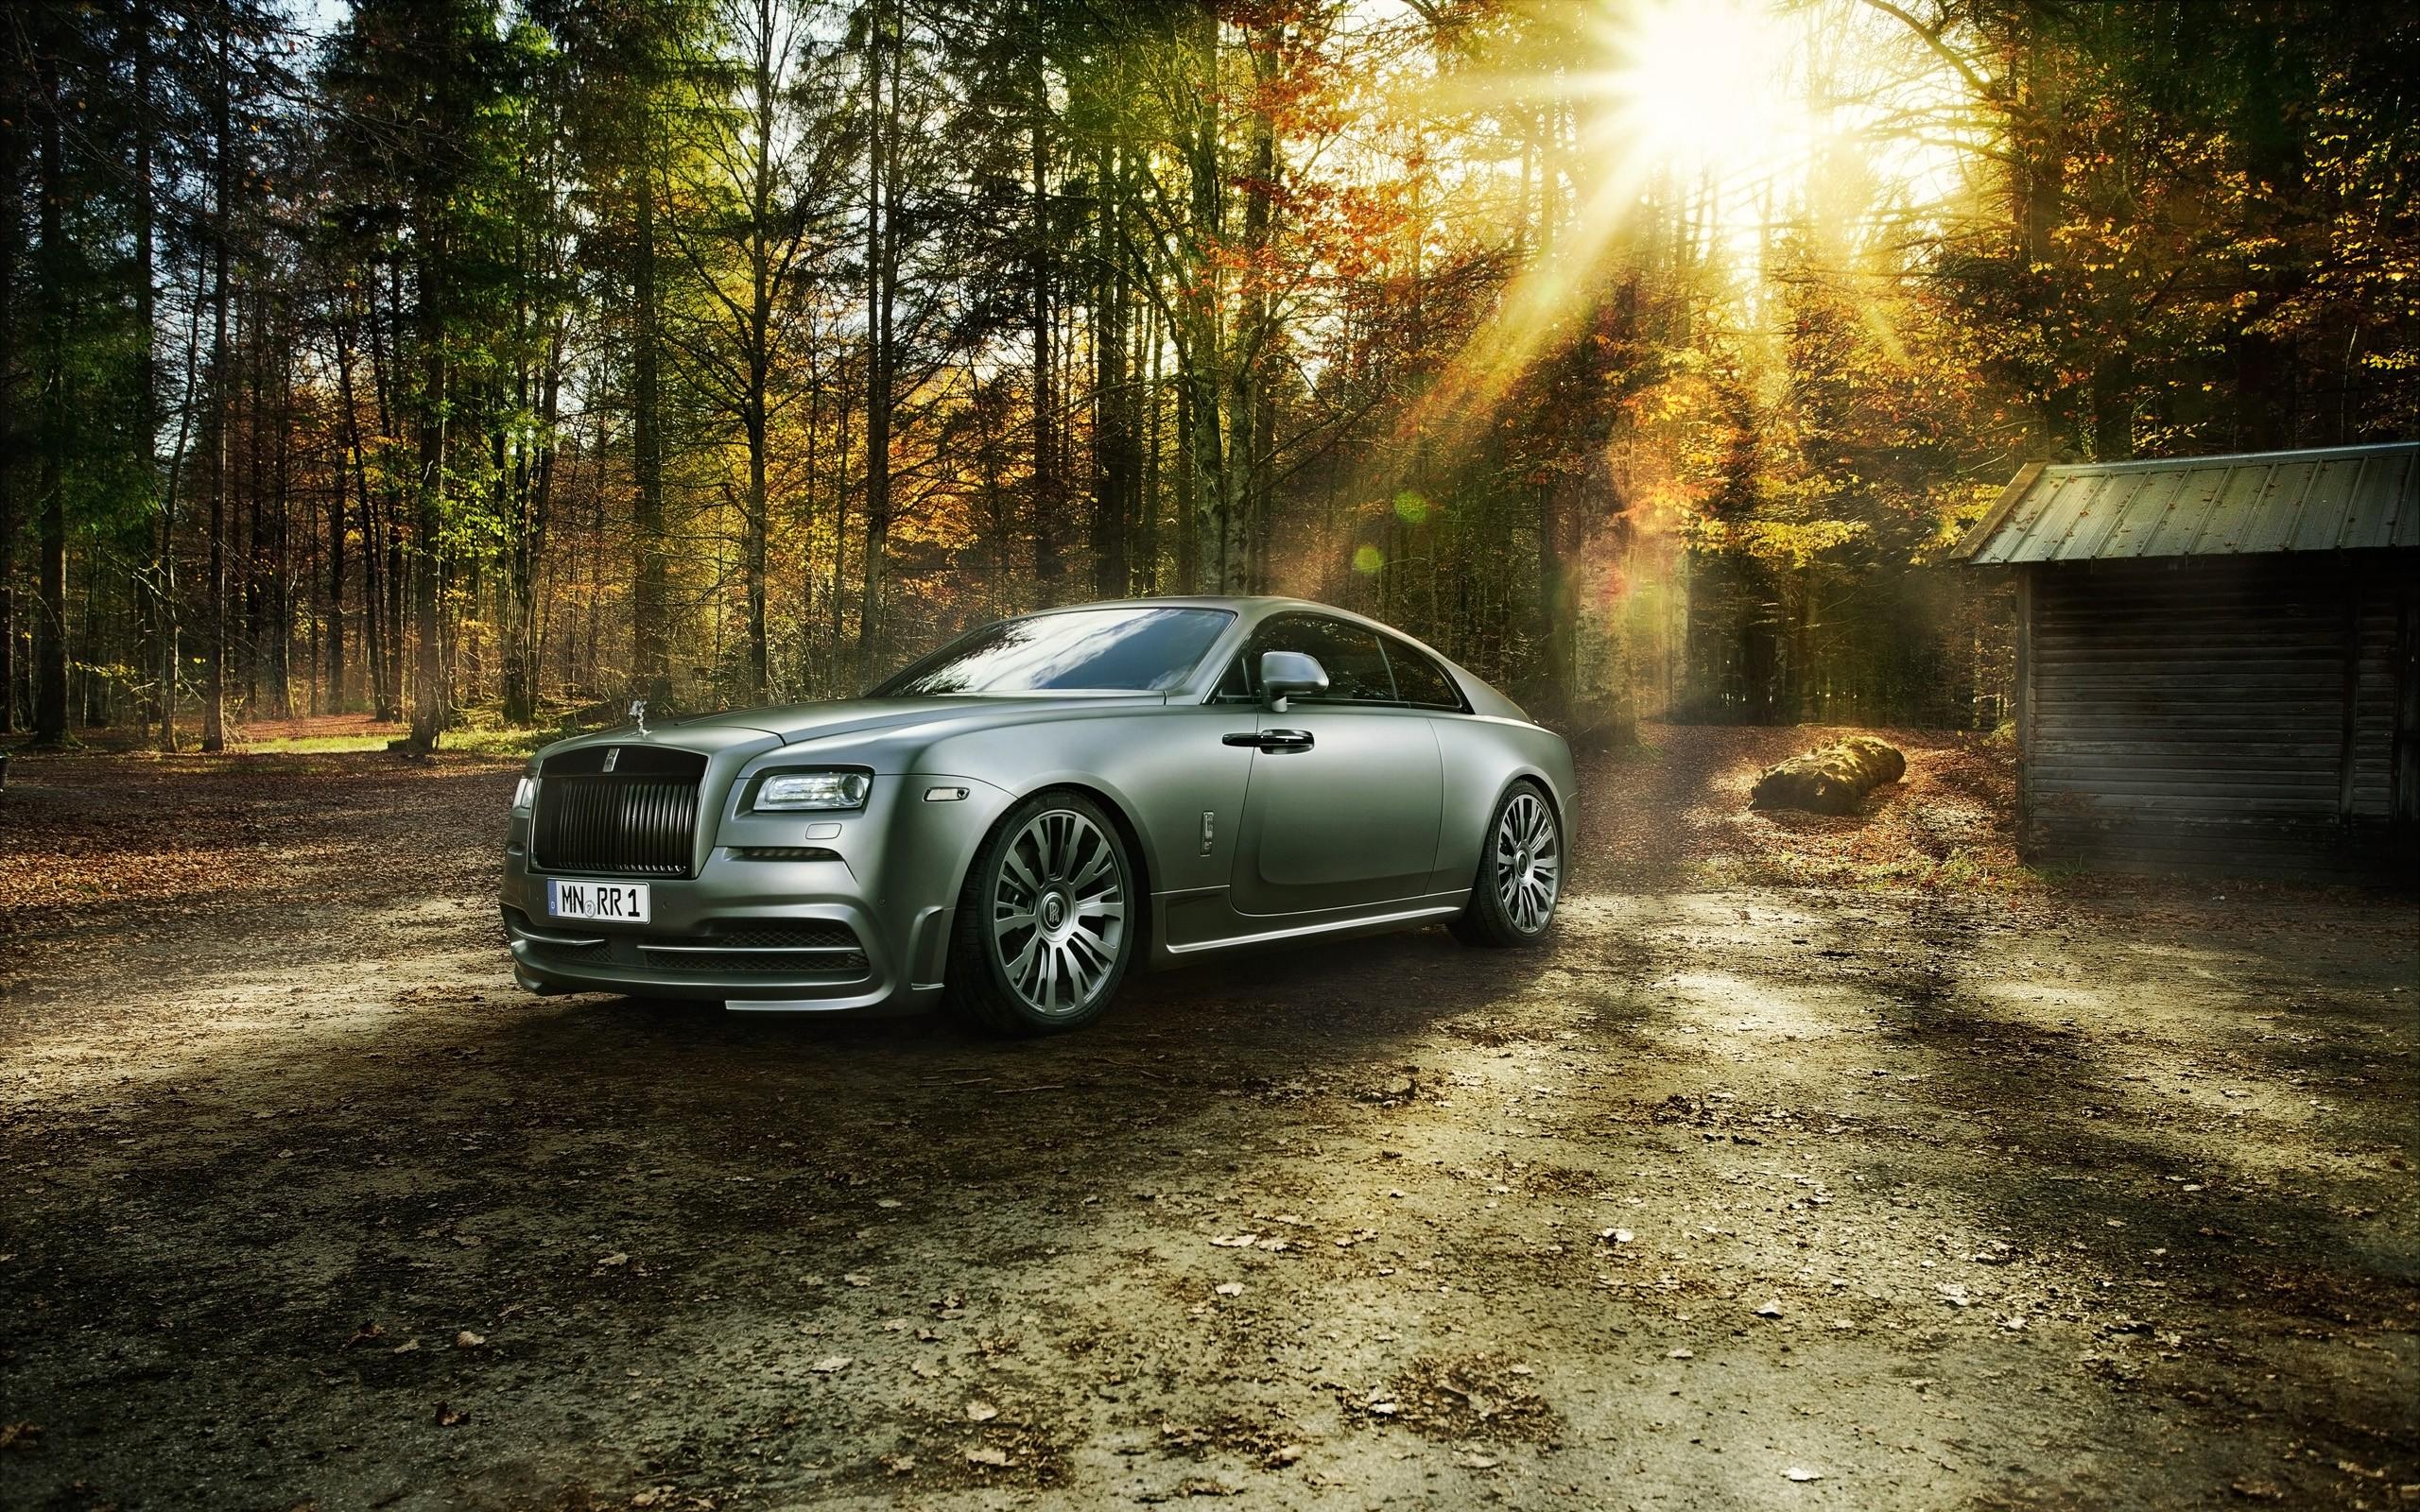 2014 Spofec Rolls Royce Wraith 2 Wallpaper